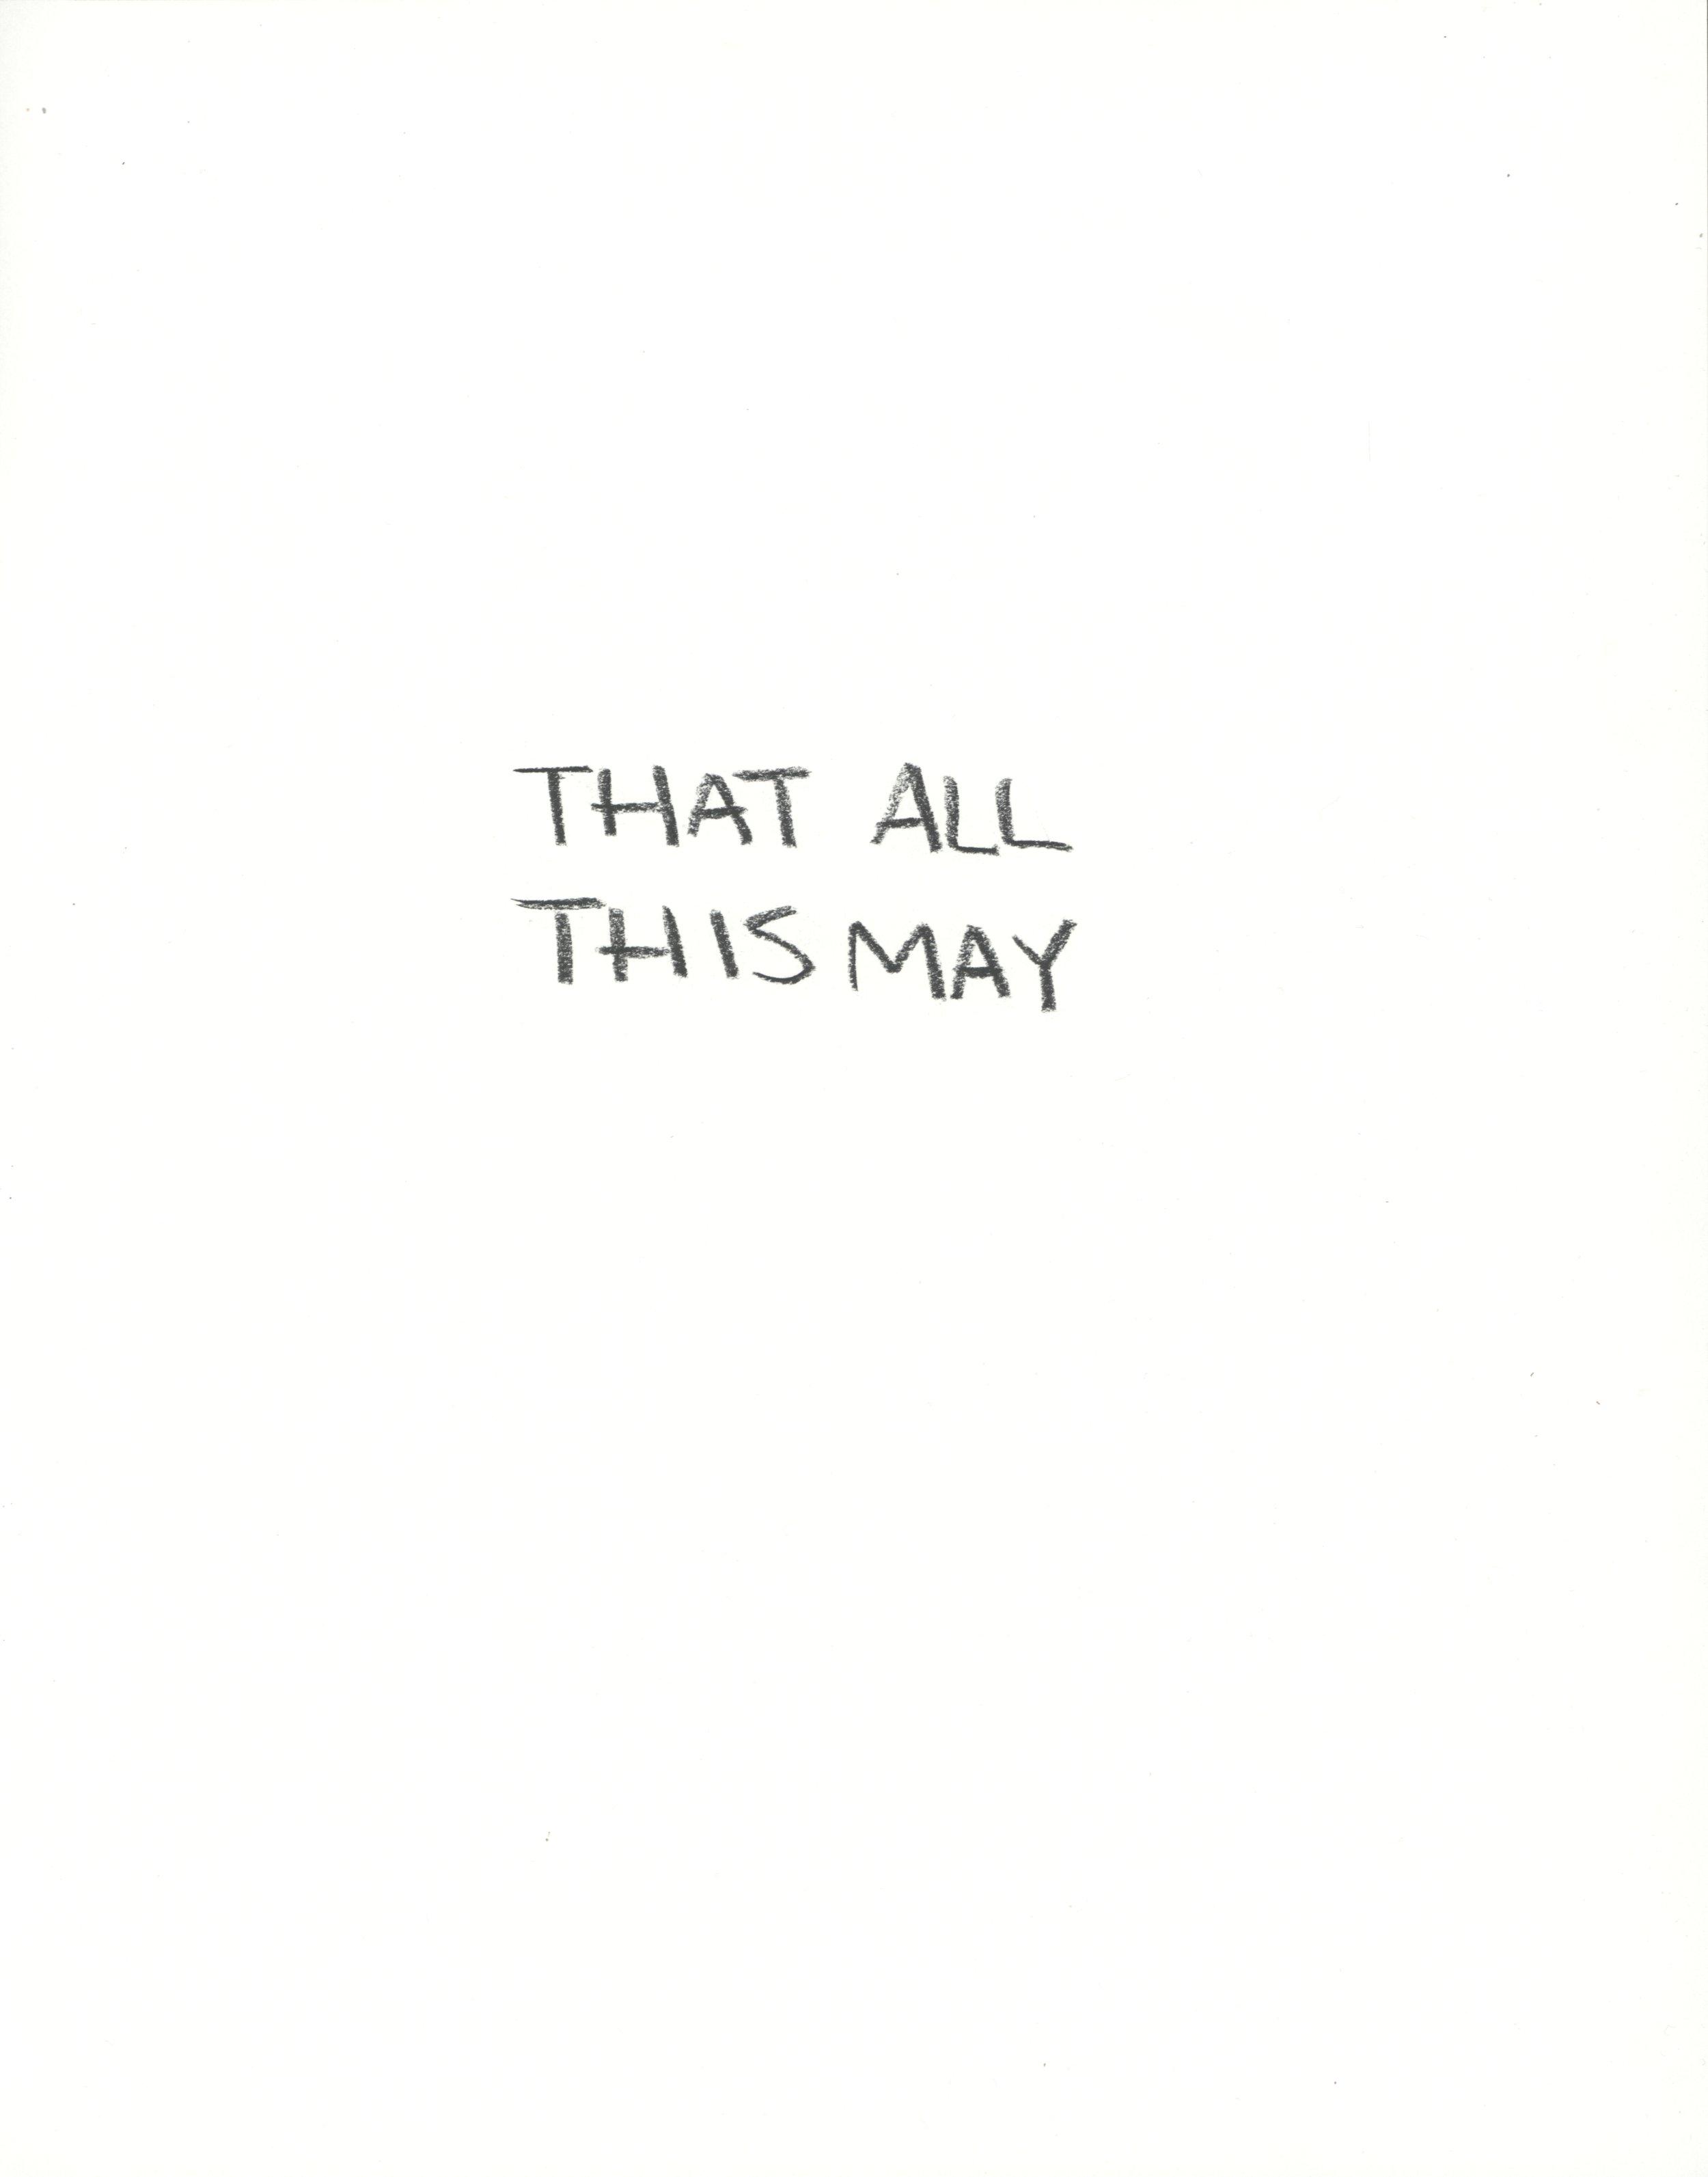 thatall.jpg